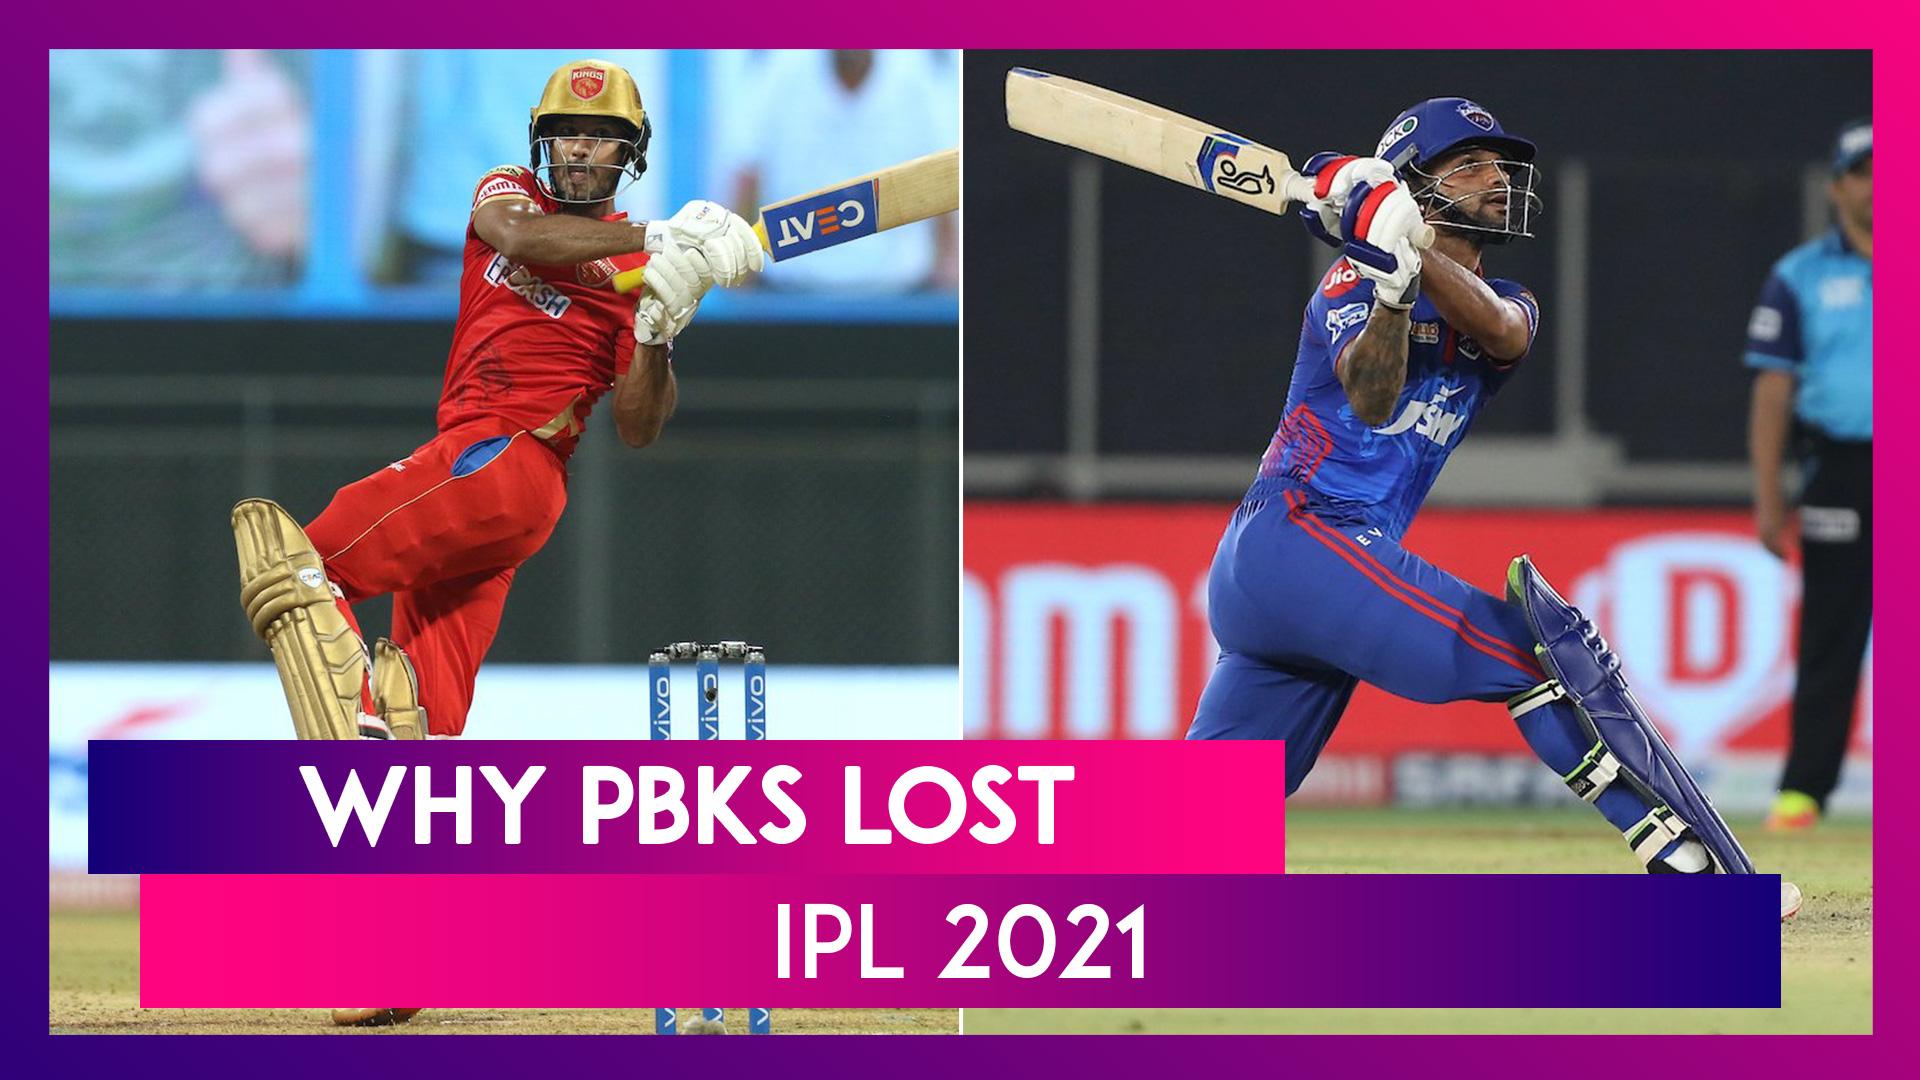 Punjab vs Delhi IPL 2021: 3 Reasons Why Punjab Lost